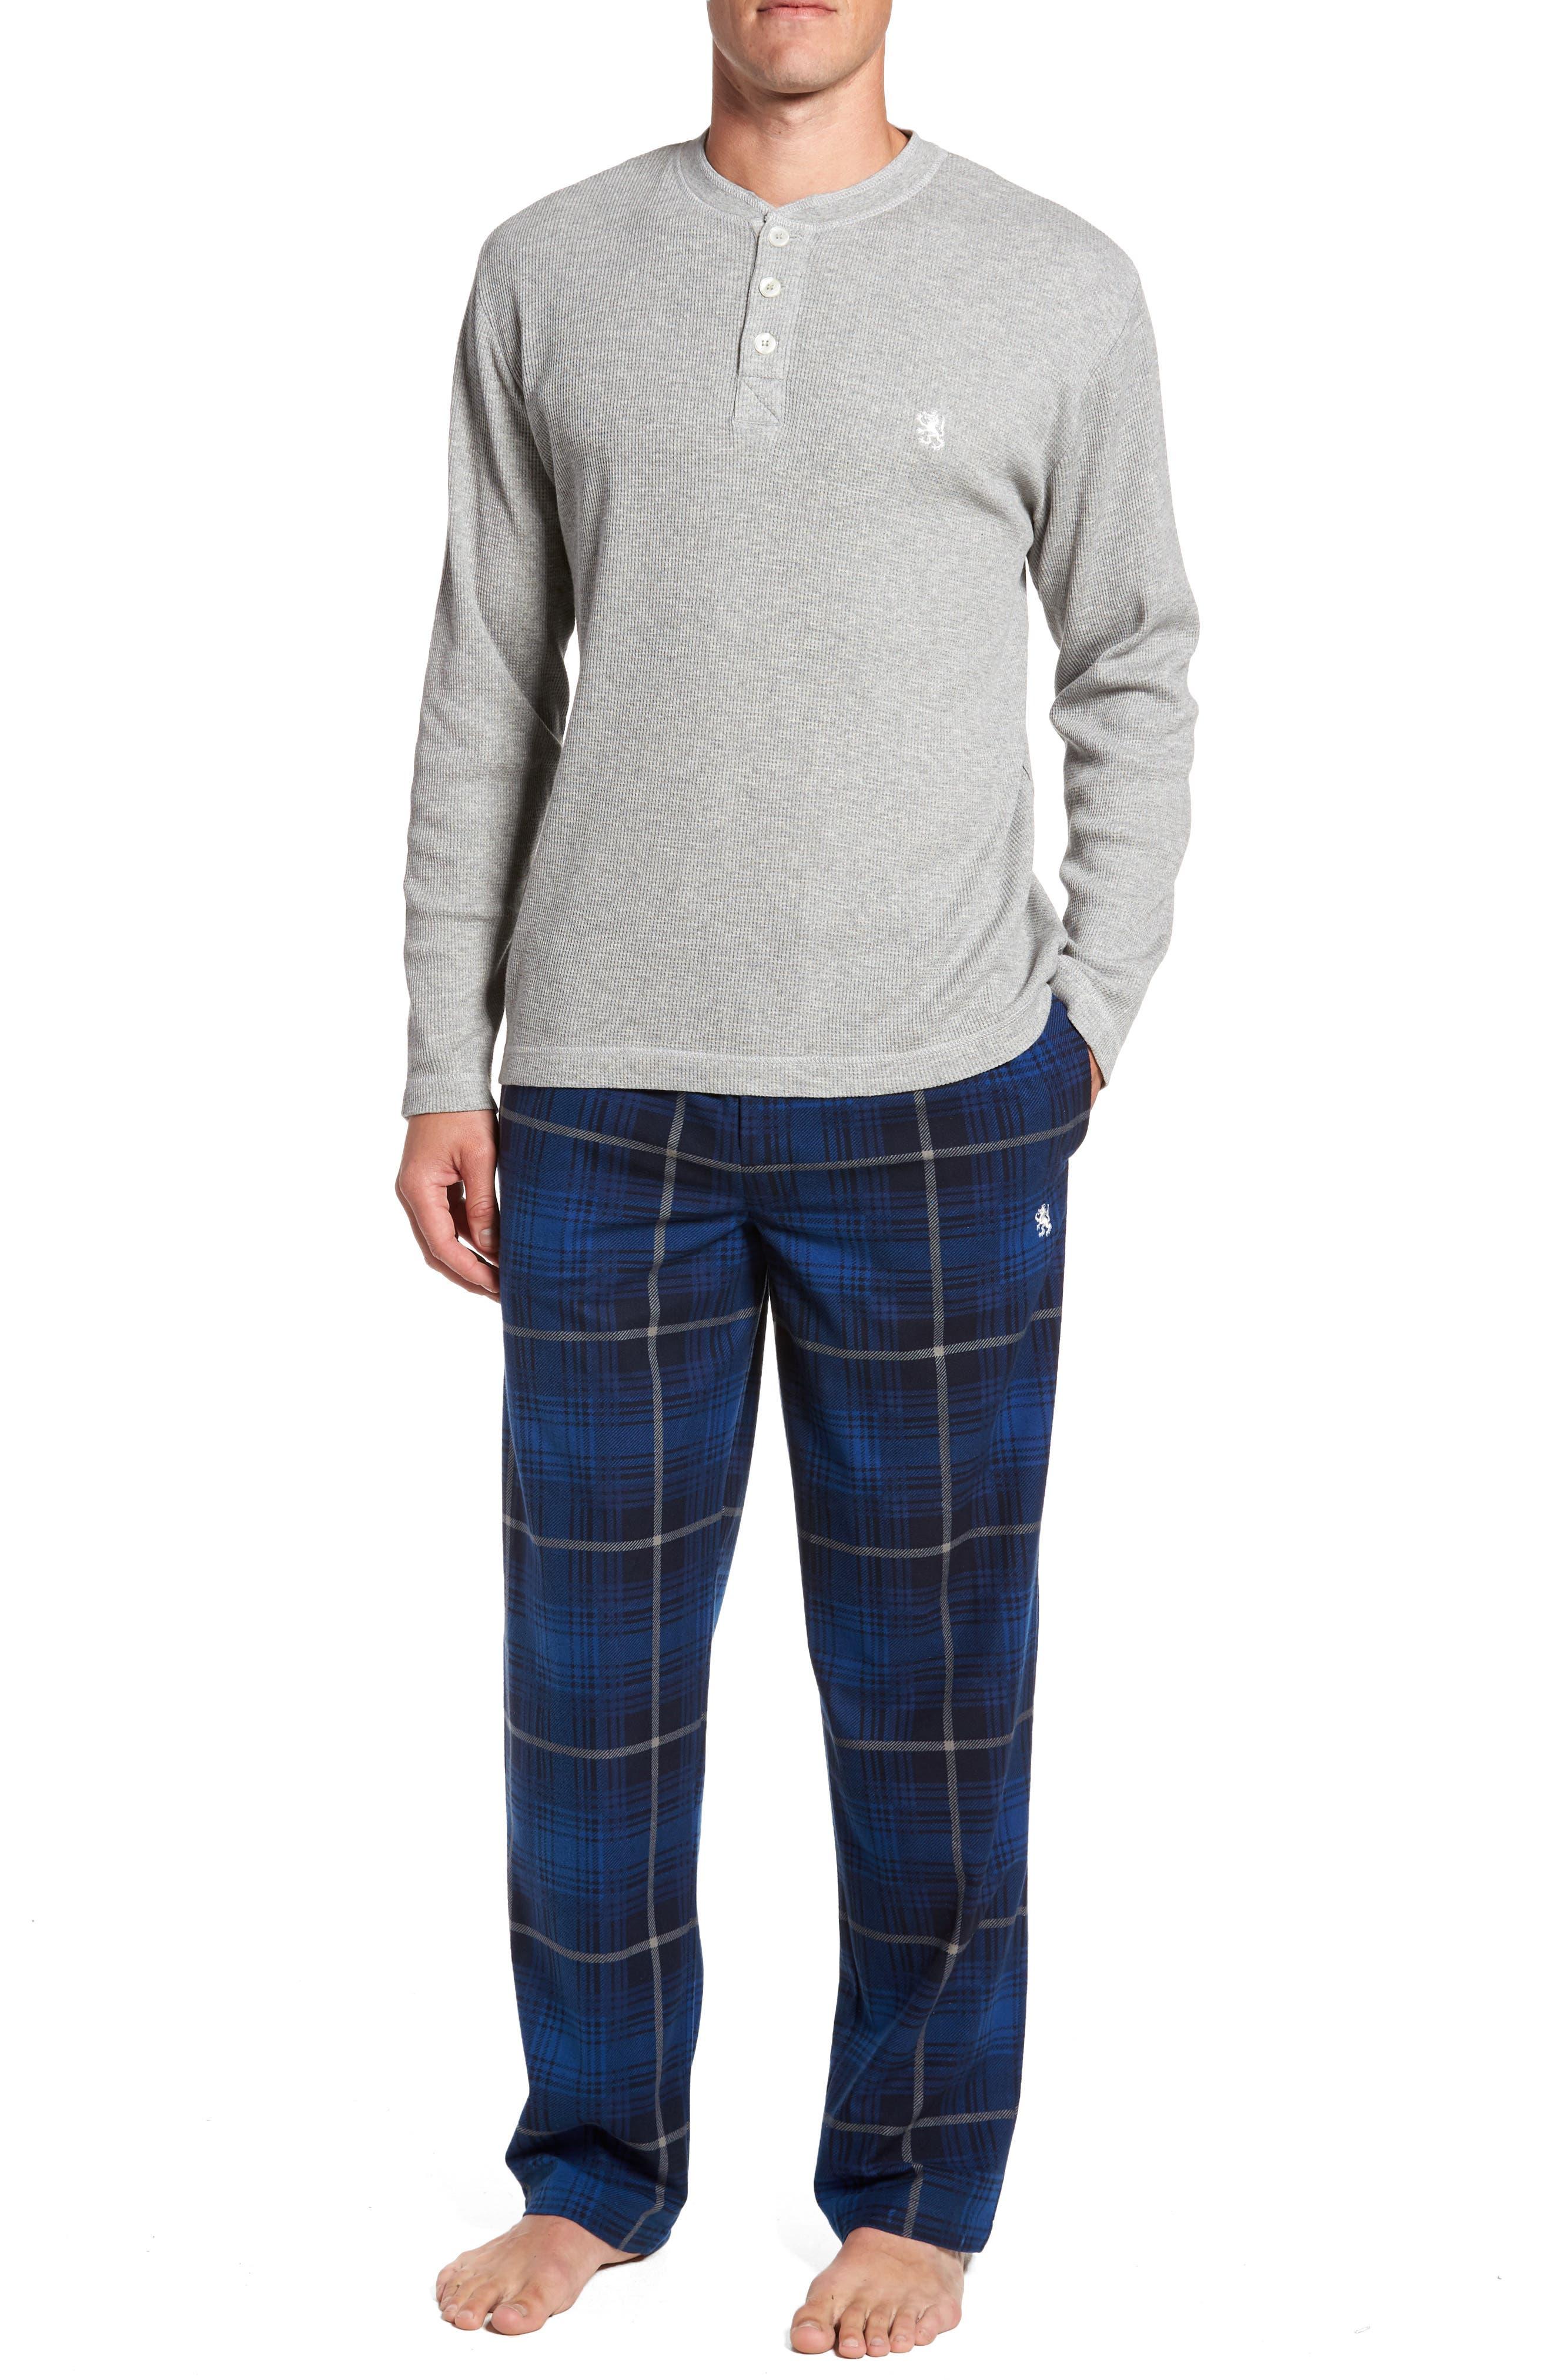 Nifty Gift Henley Shirt & Lounge Pants,                         Main,                         color, 025